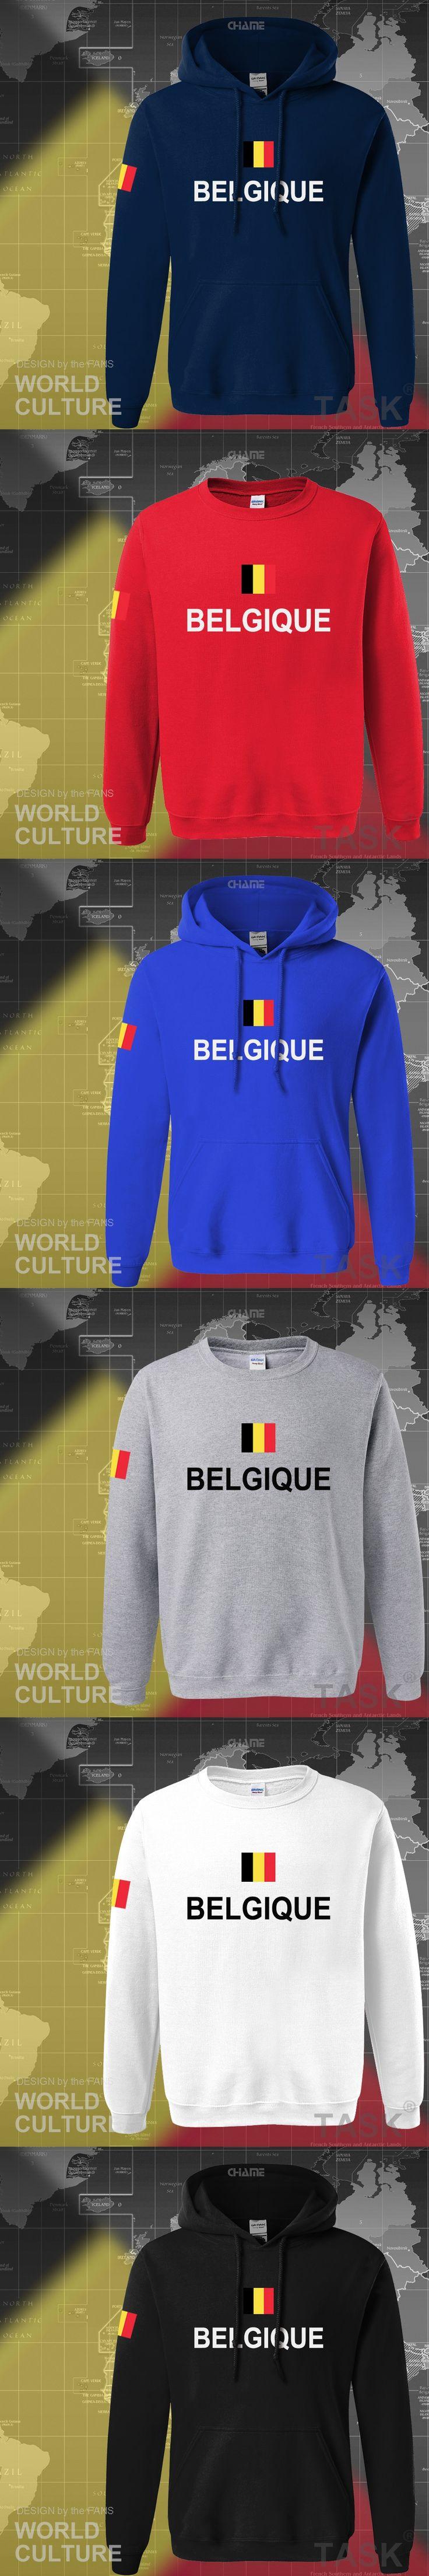 Belgium hoodie men 2017 sweatshirt polo sweat new hip hop streetwear clothing jerseys tracksuit nation Belgian flag BE belgique